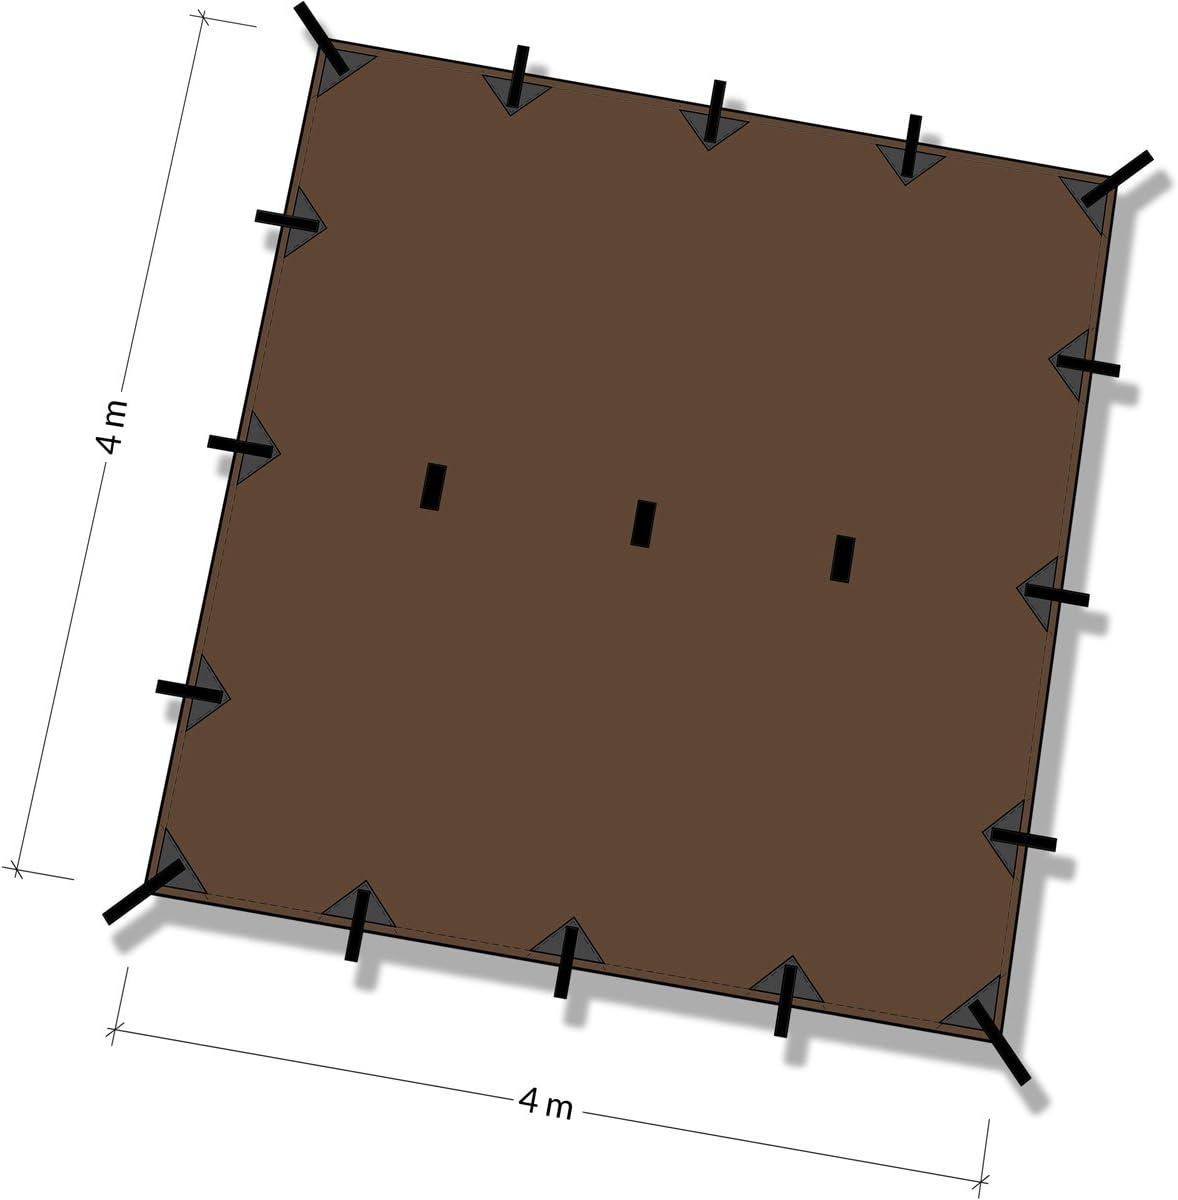 Coyote Brown DD Tarp 4x4 13ft x 13ft